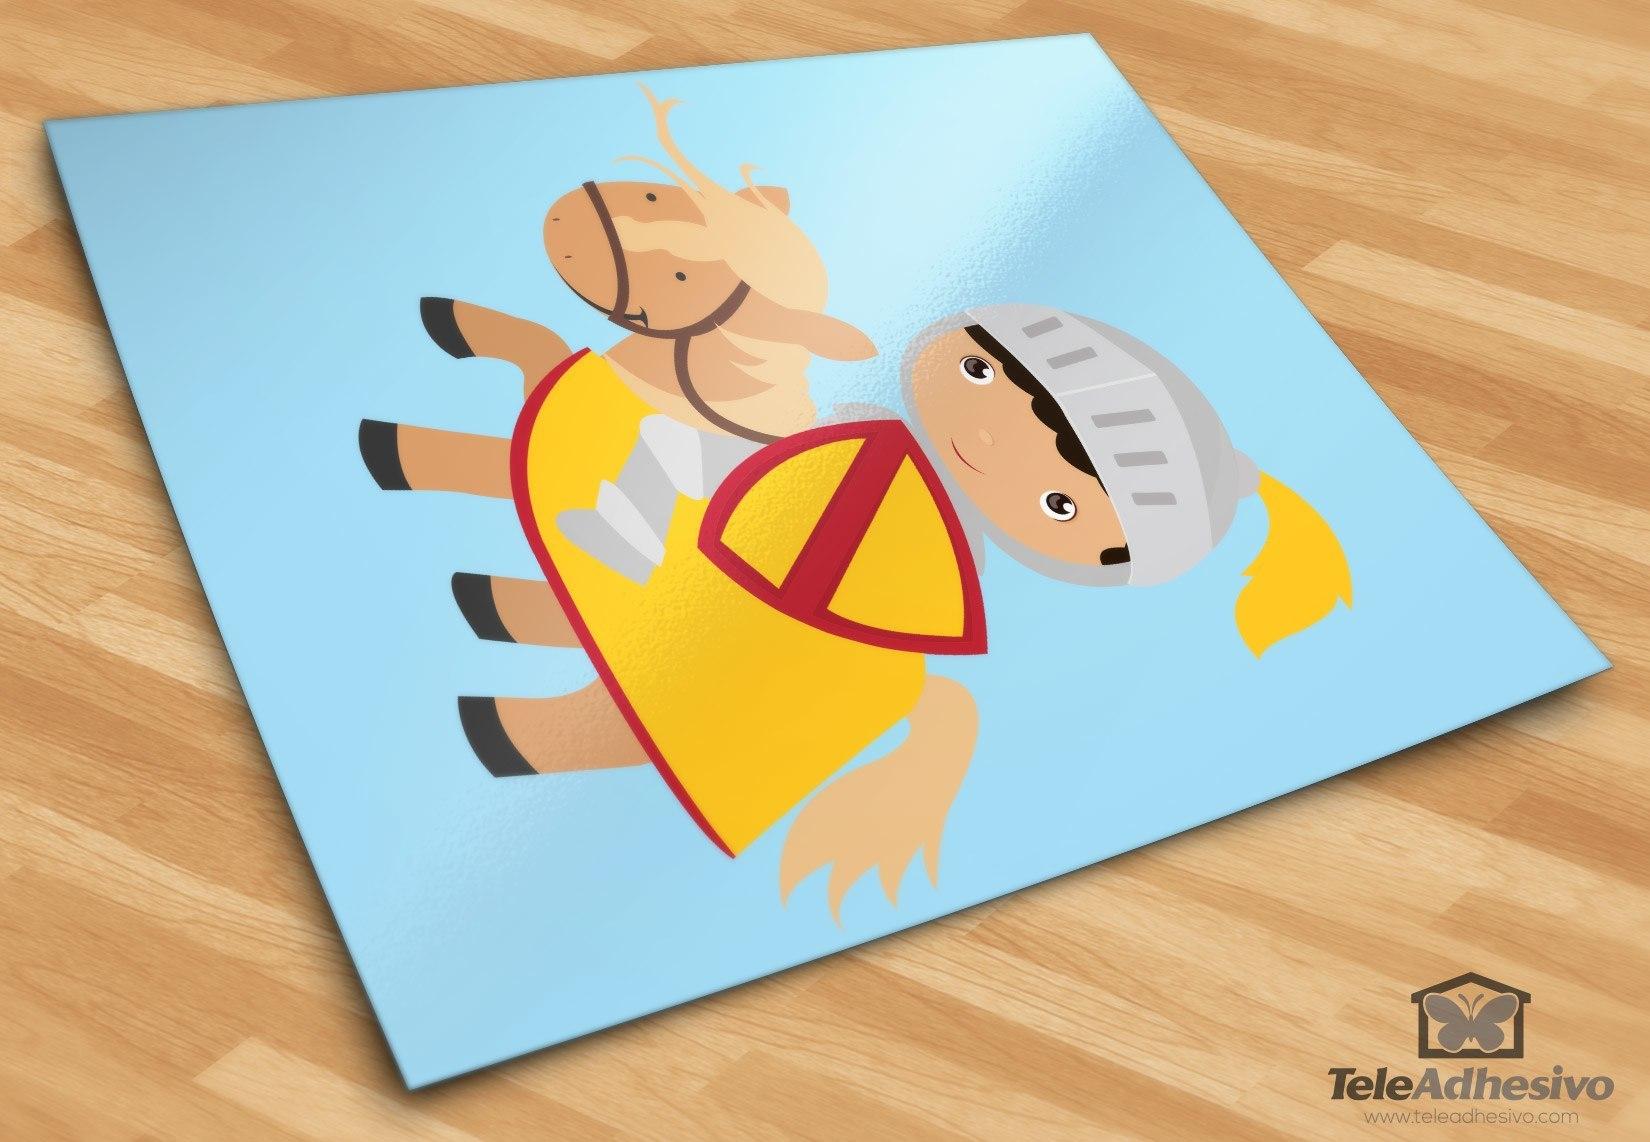 Kinderzimmer Wandtattoo: Gelb Ritter